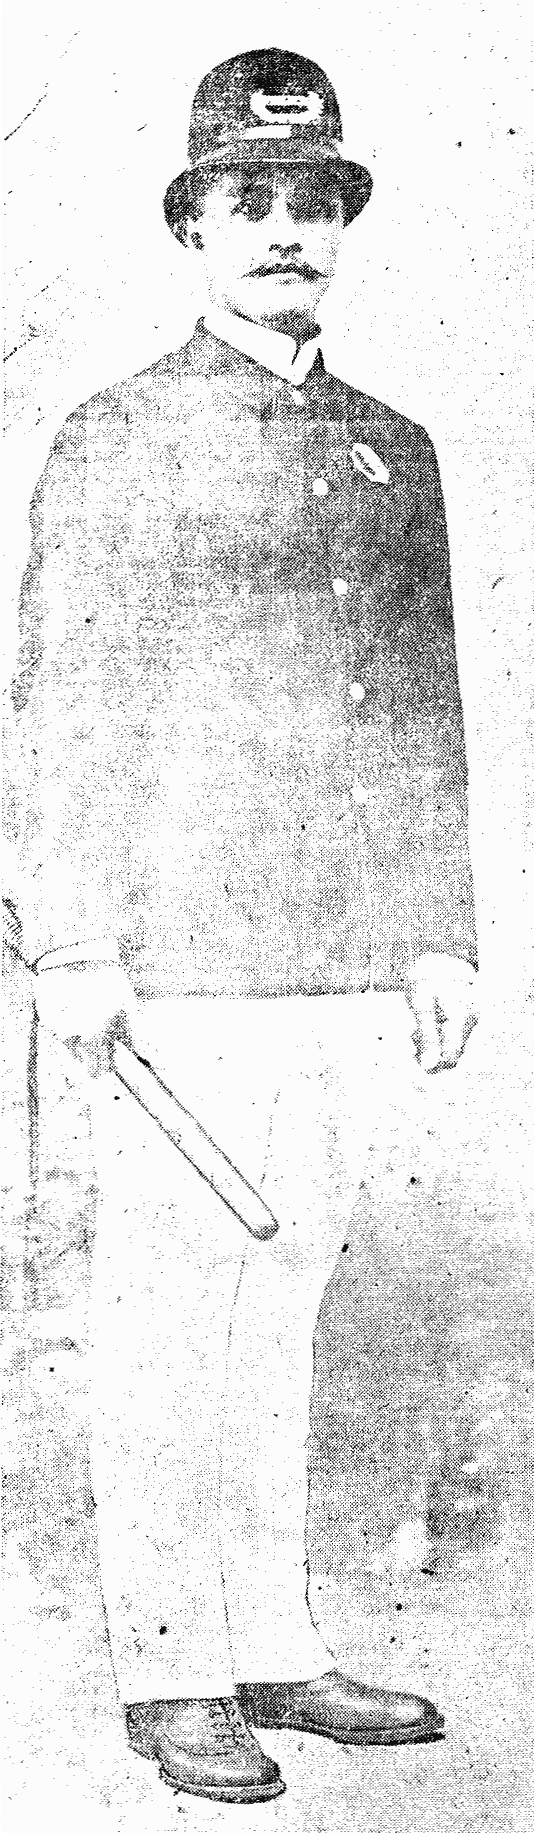 Kuokoa_11_8_1923_4